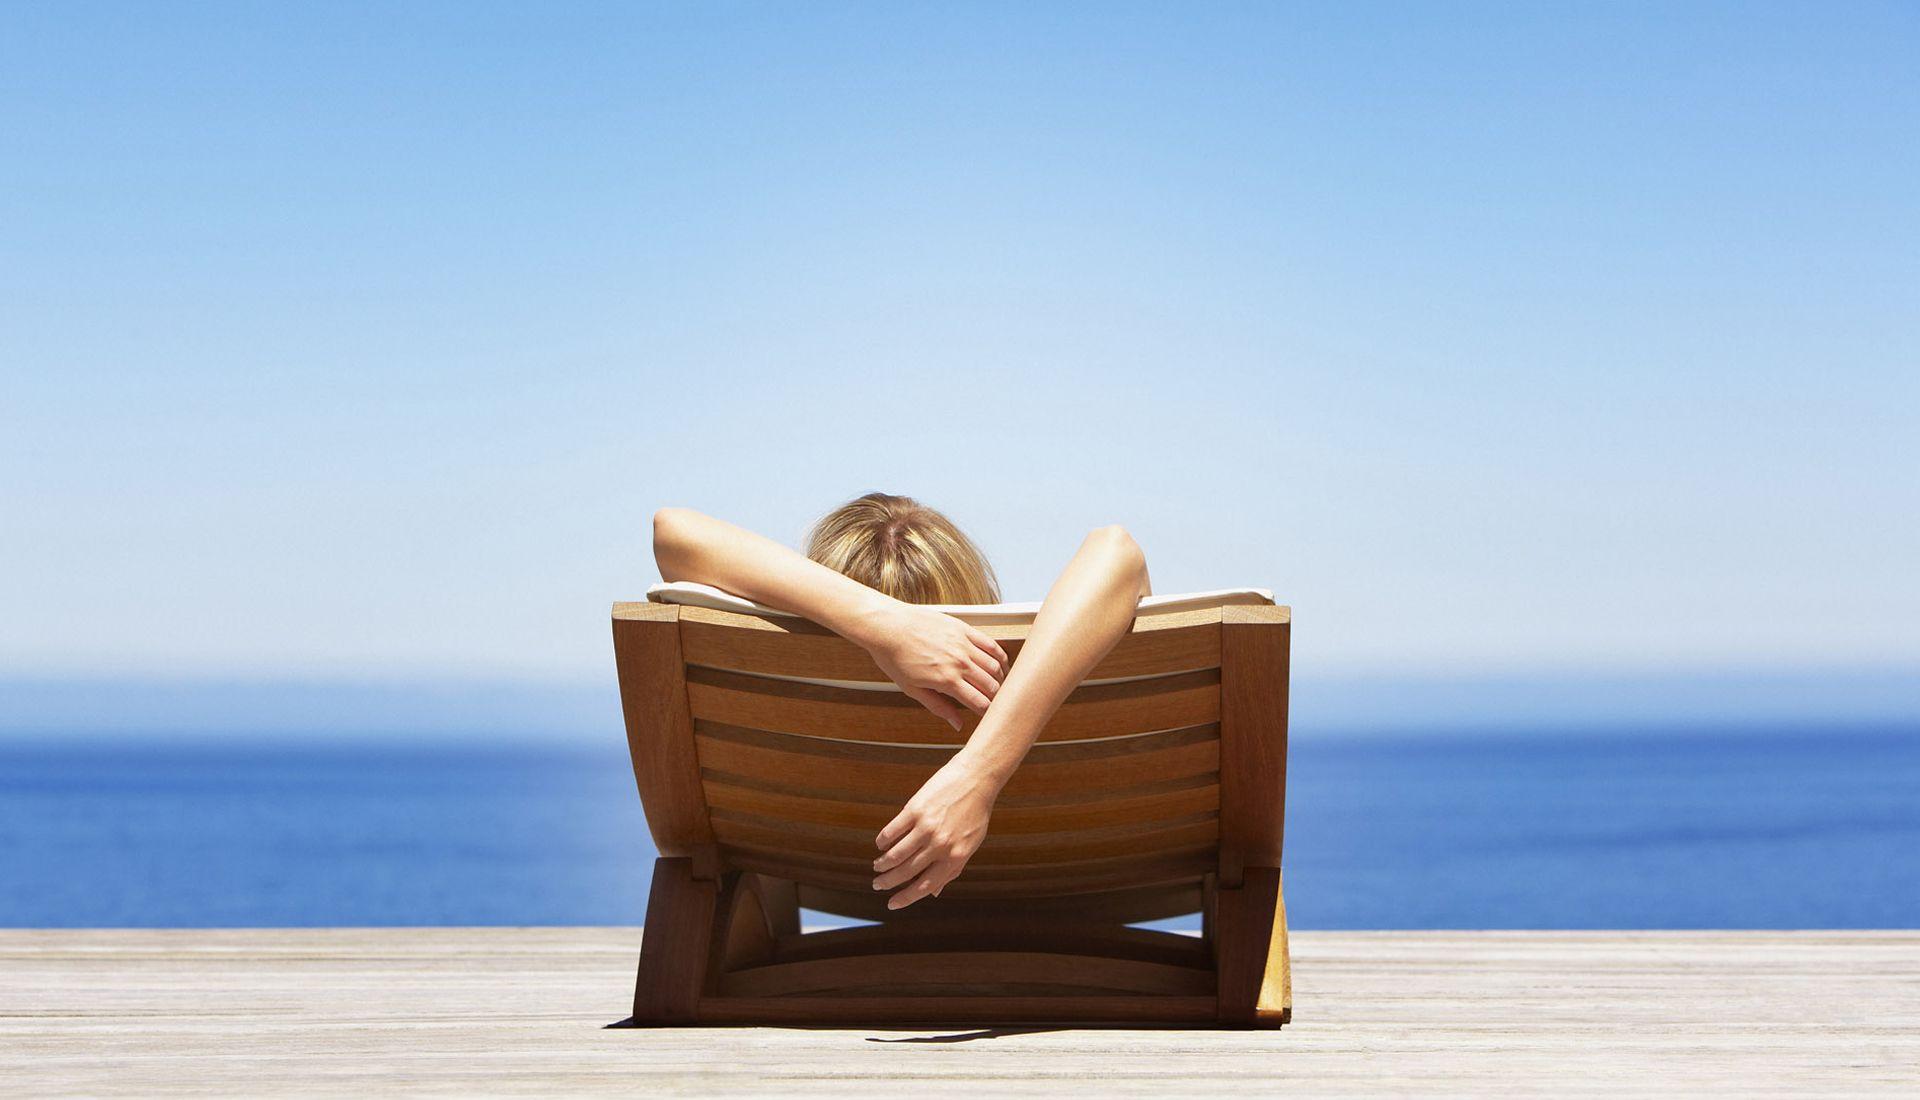 Want to live on the beach? www.vegardflekstad.com